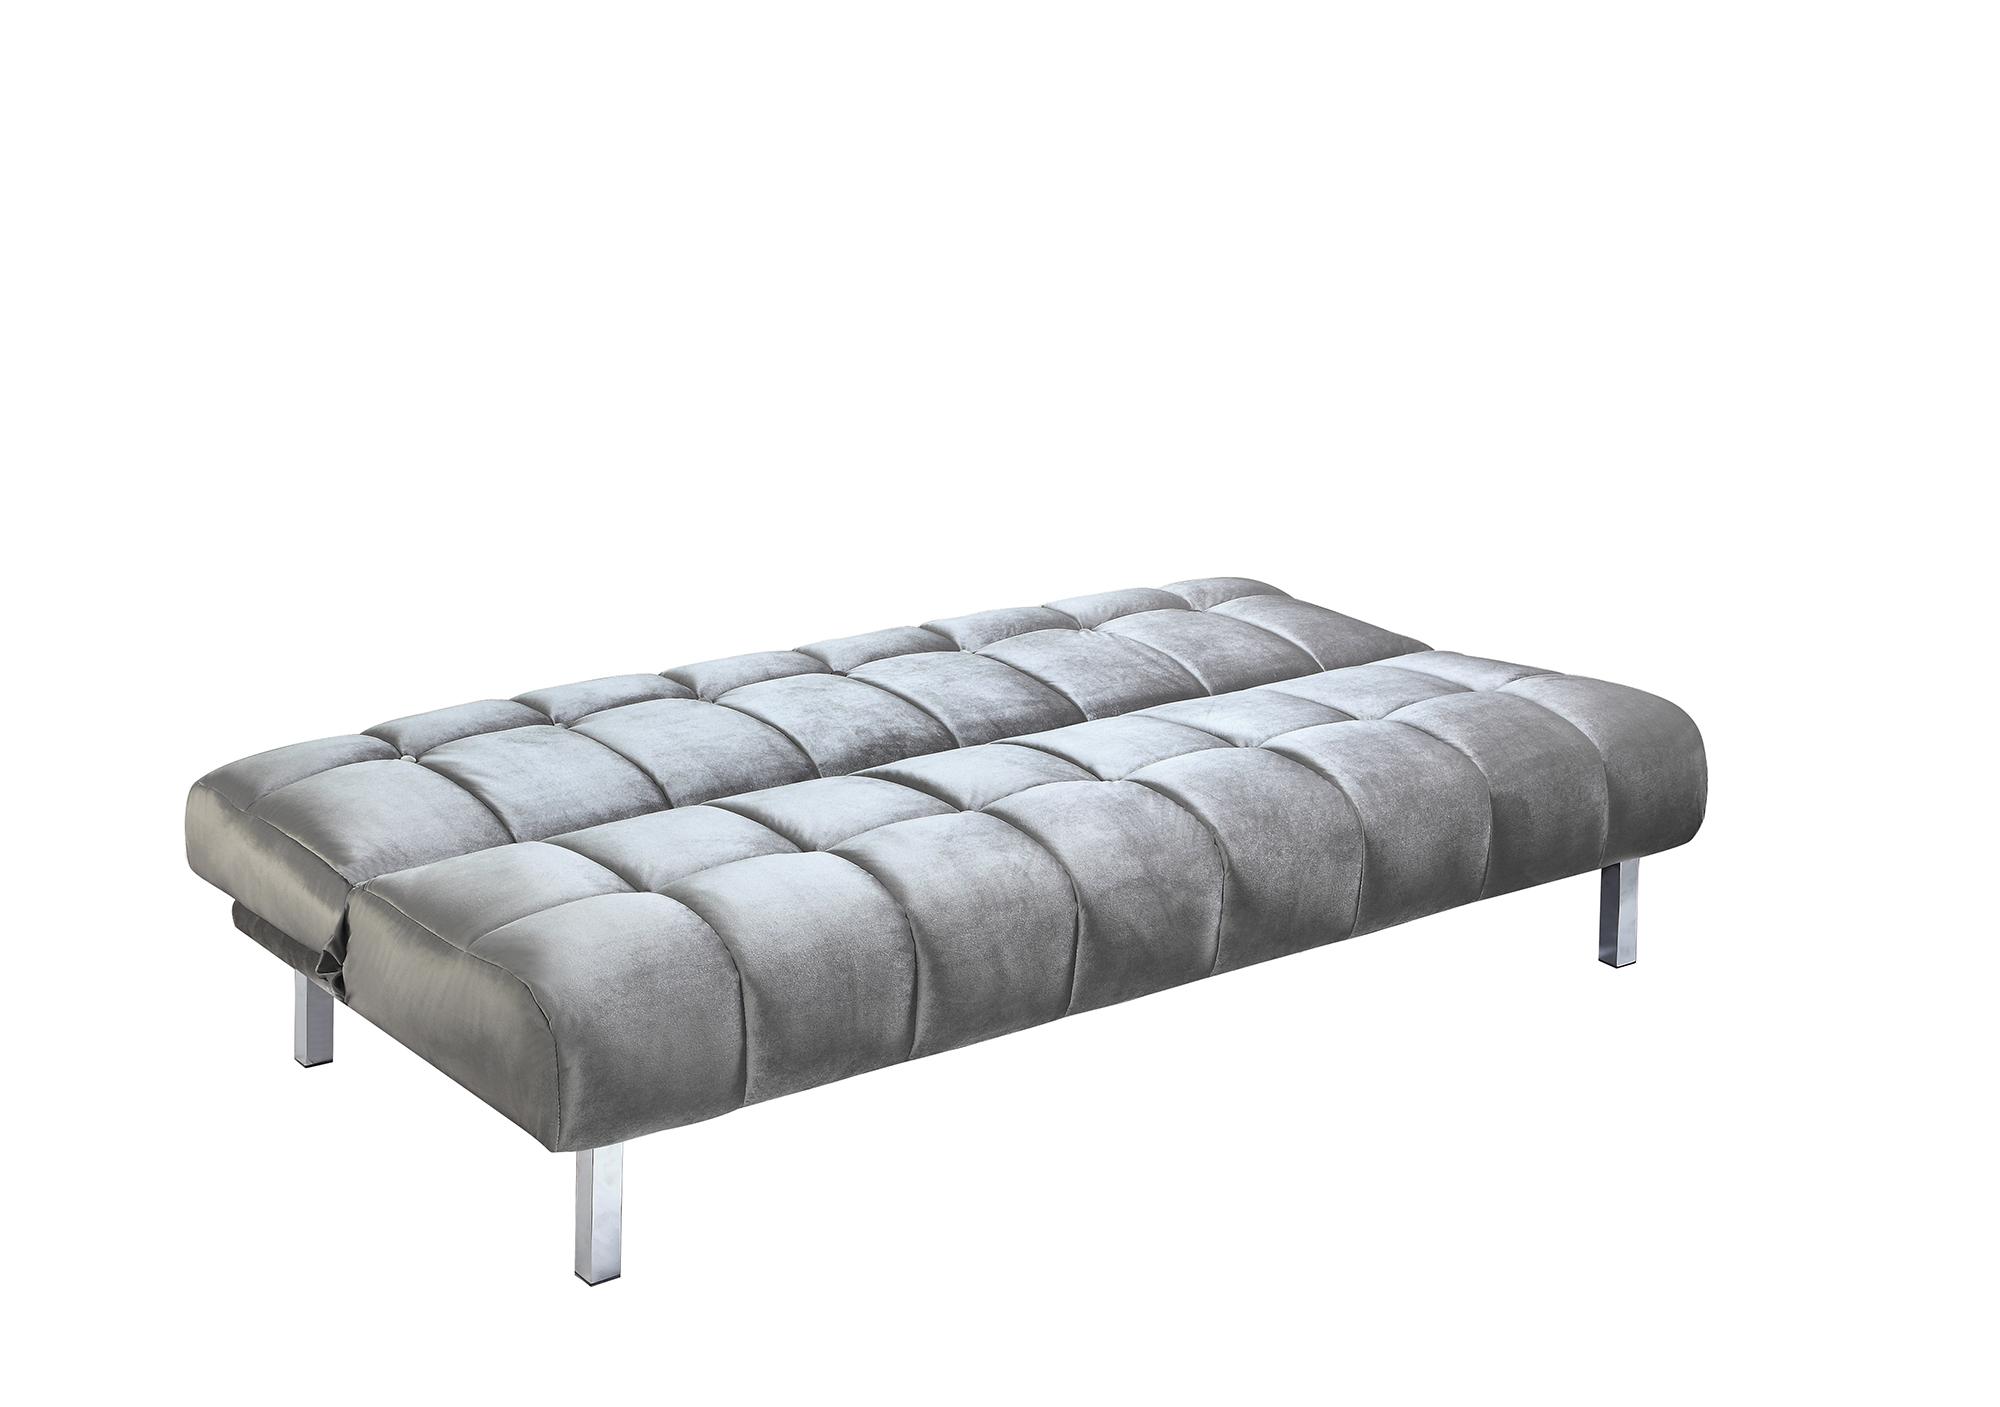 coasters sofa bed brandy leather coaster fabric with grey finish 360002 ebay